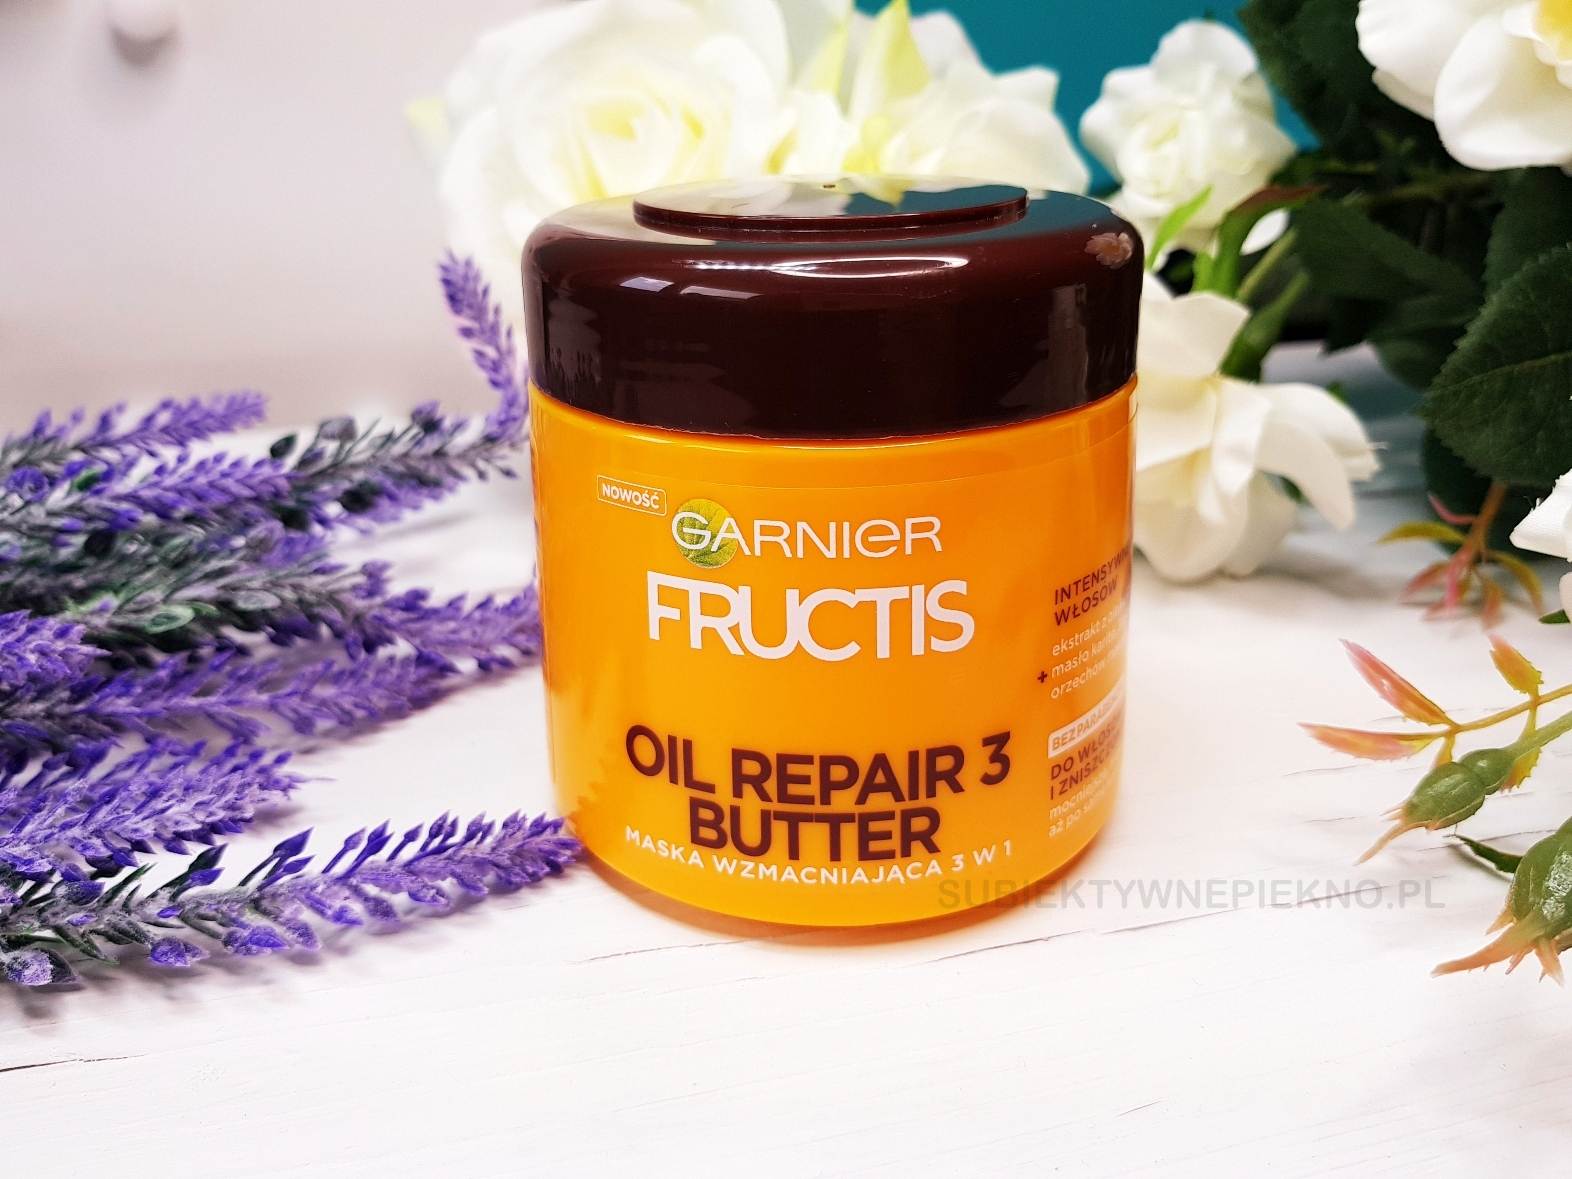 Wzmacniająca maska do włosów Garnier Fructis Oil Repair 3 Butter.